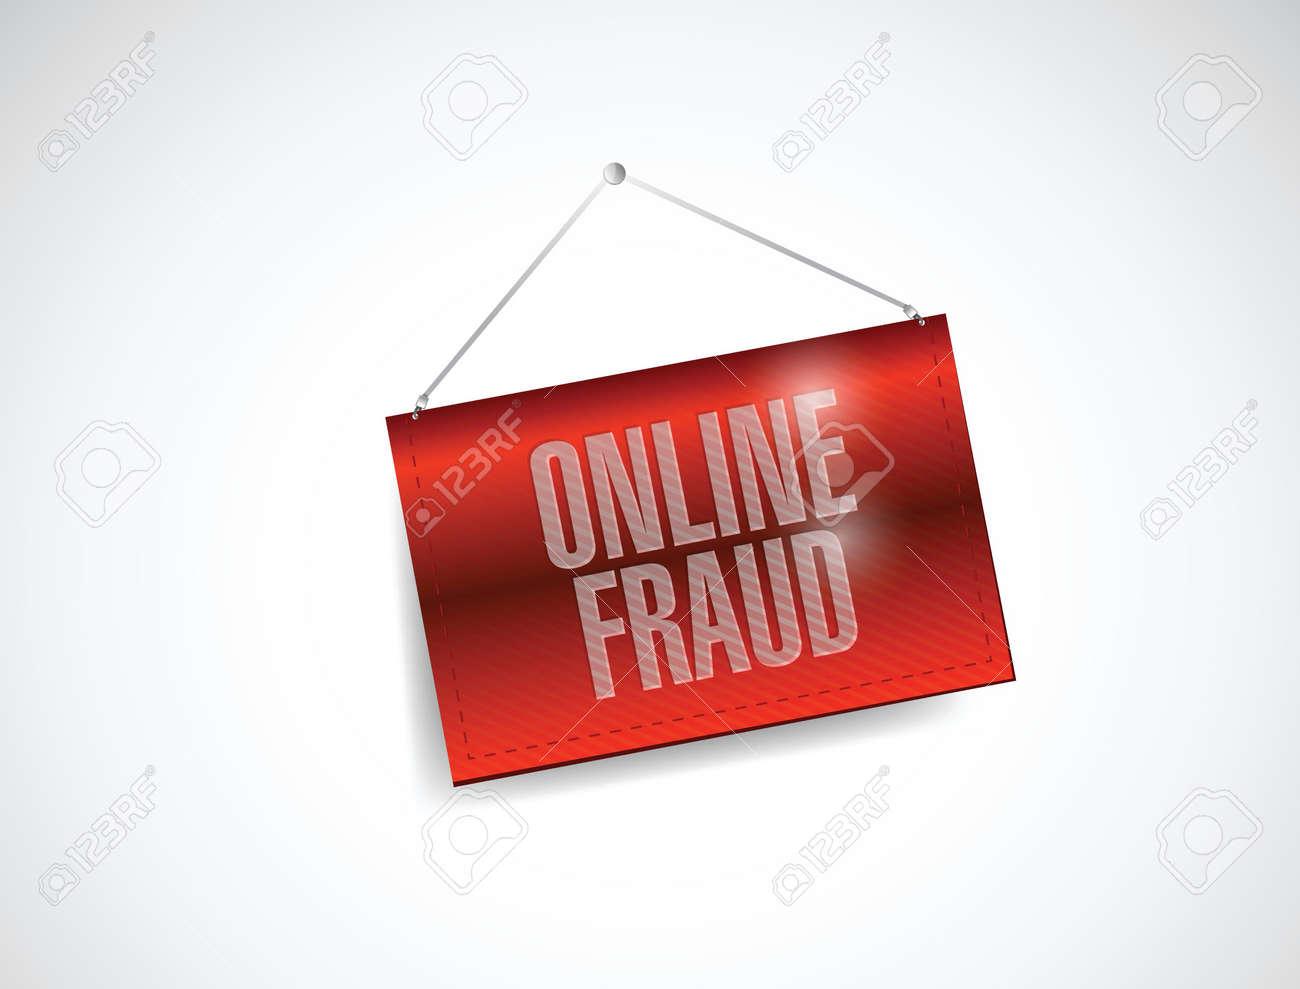 online fraud hanging banner illustration design over a white background Stock Vector - 24654896